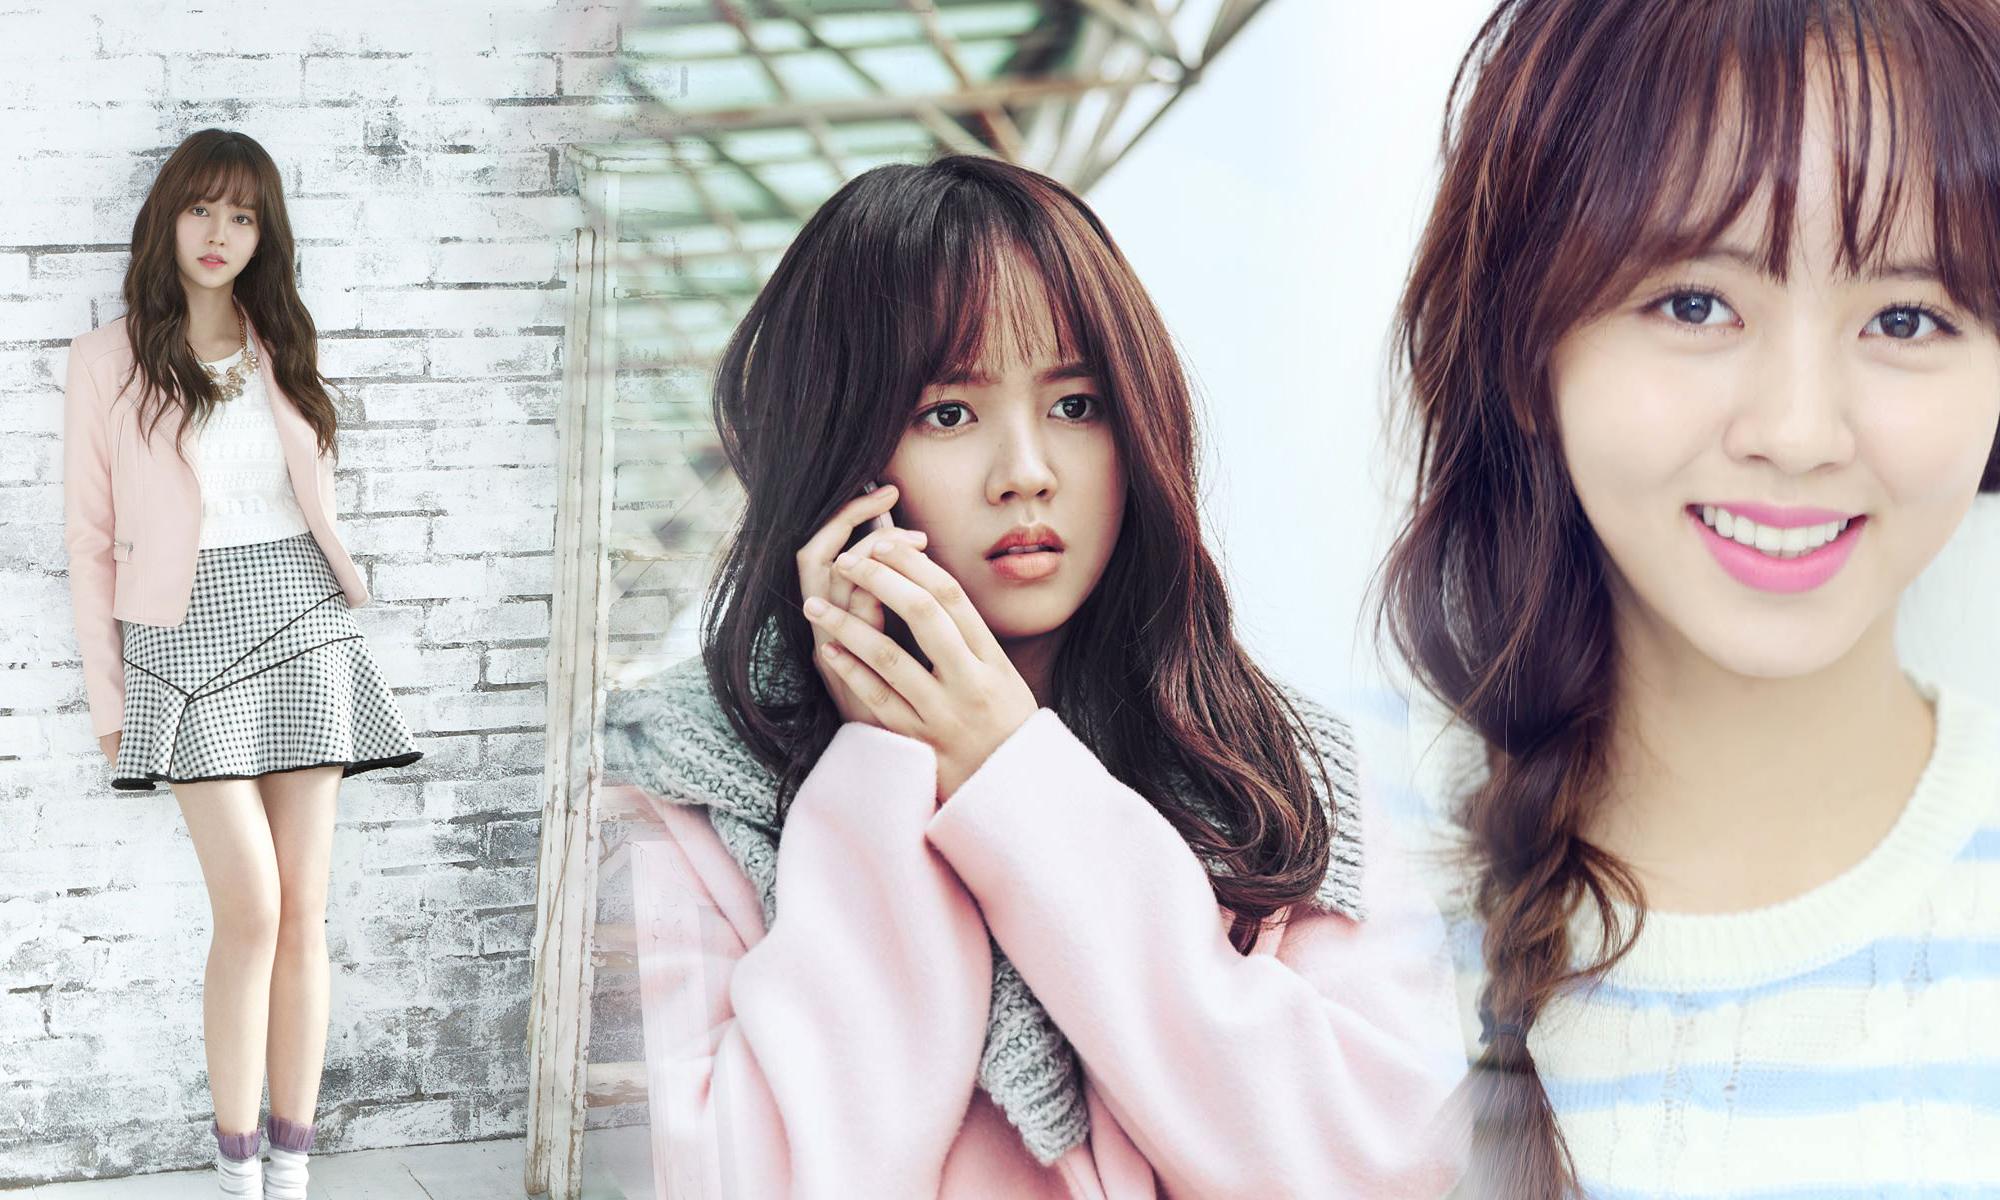 Profil Lengkap Foto Dan Fakta Menarik Kim So Hyun JauhariNET